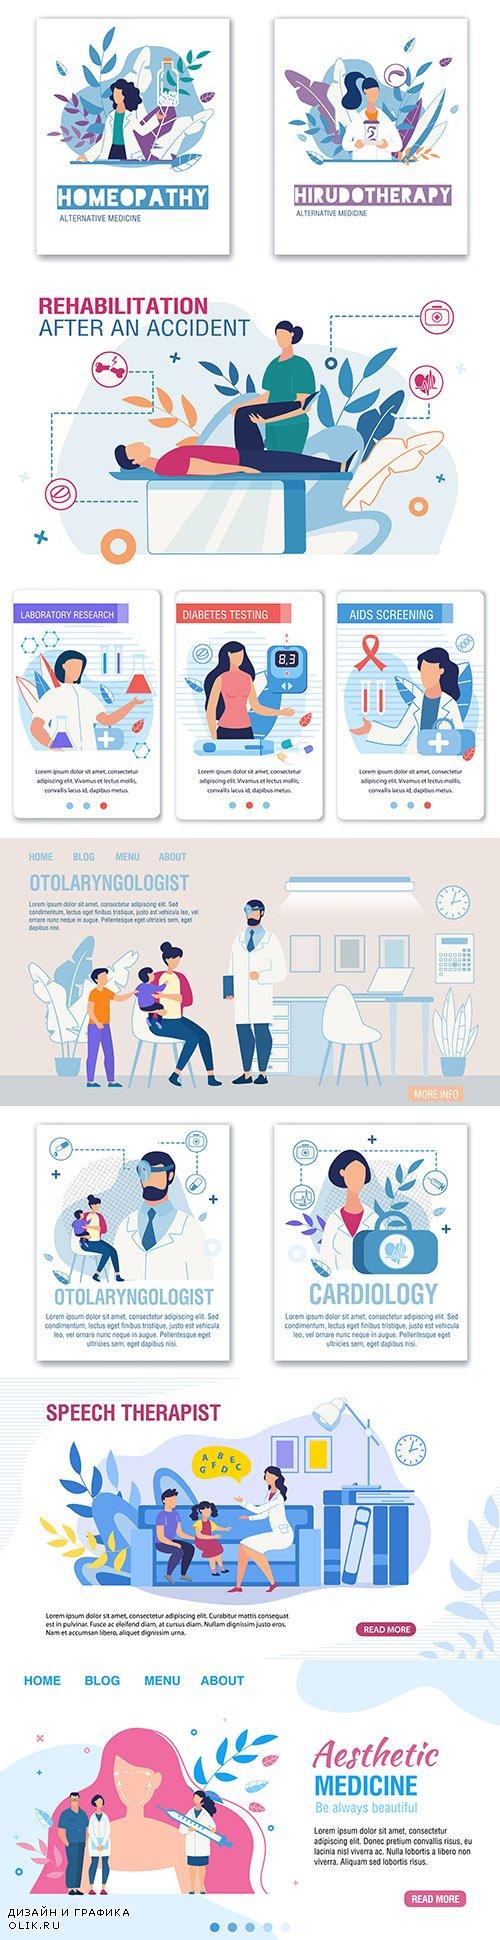 Medicine and equipment isometric icons flat design 14